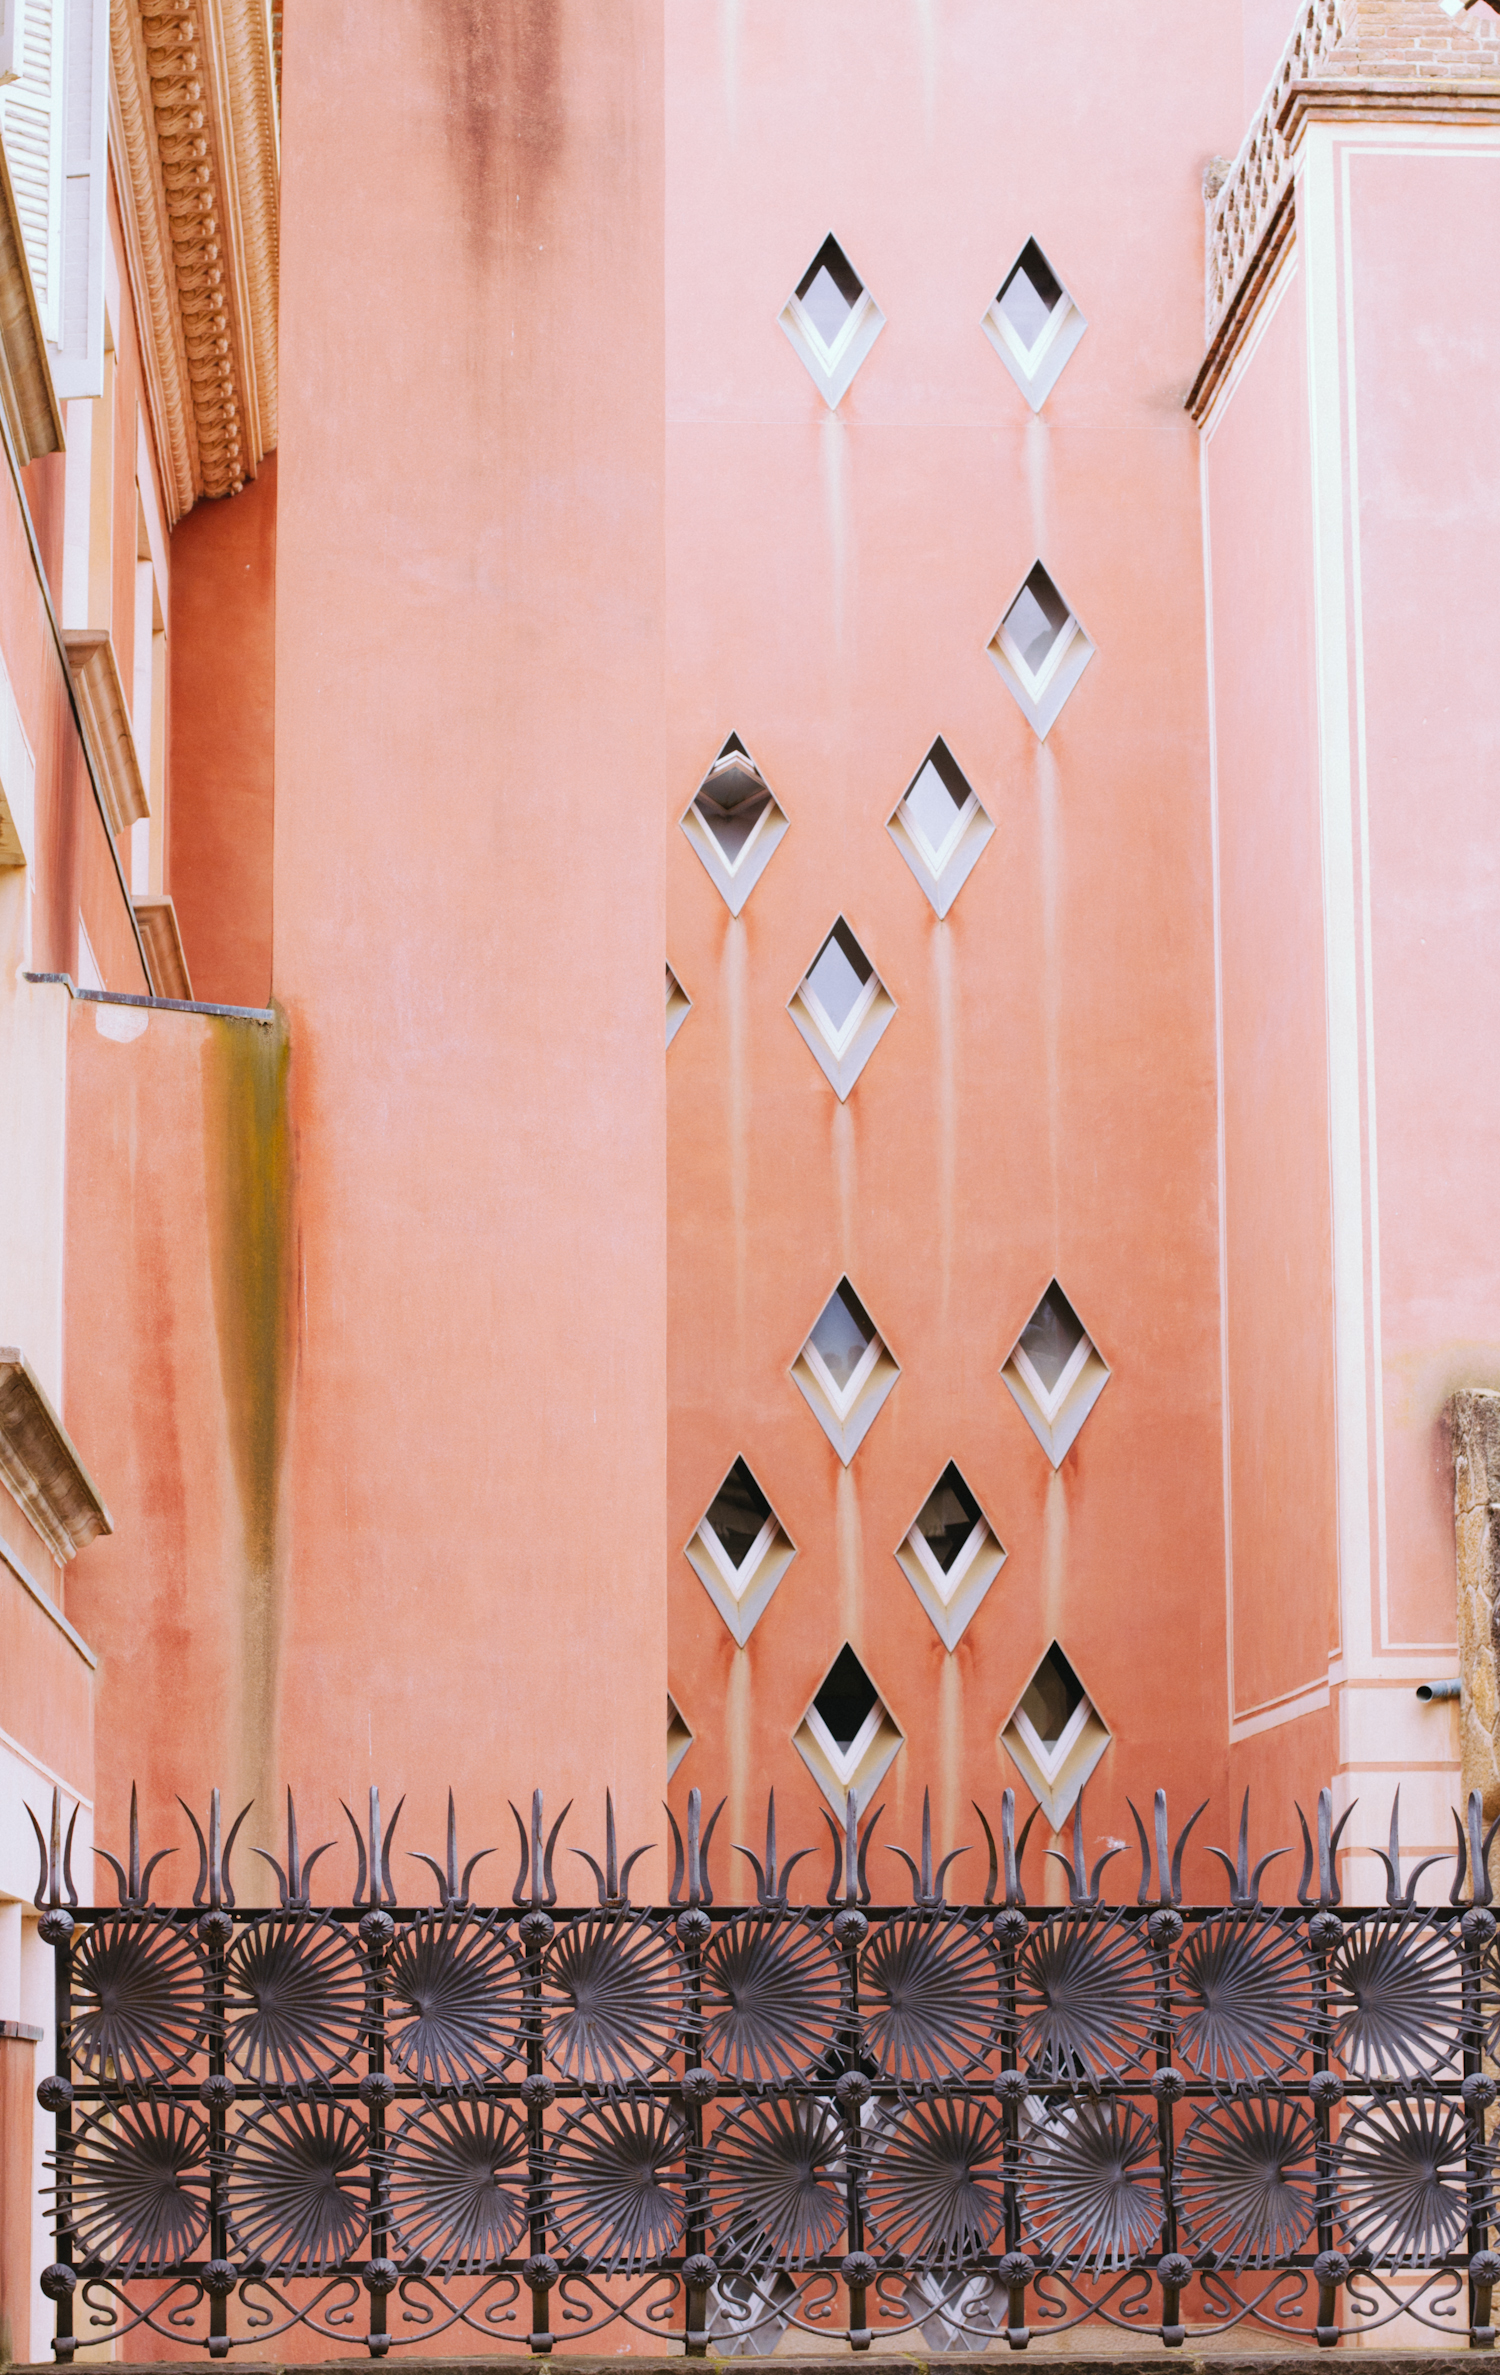 Barcelona Spain Park Guell by Bryna Shields.jpg